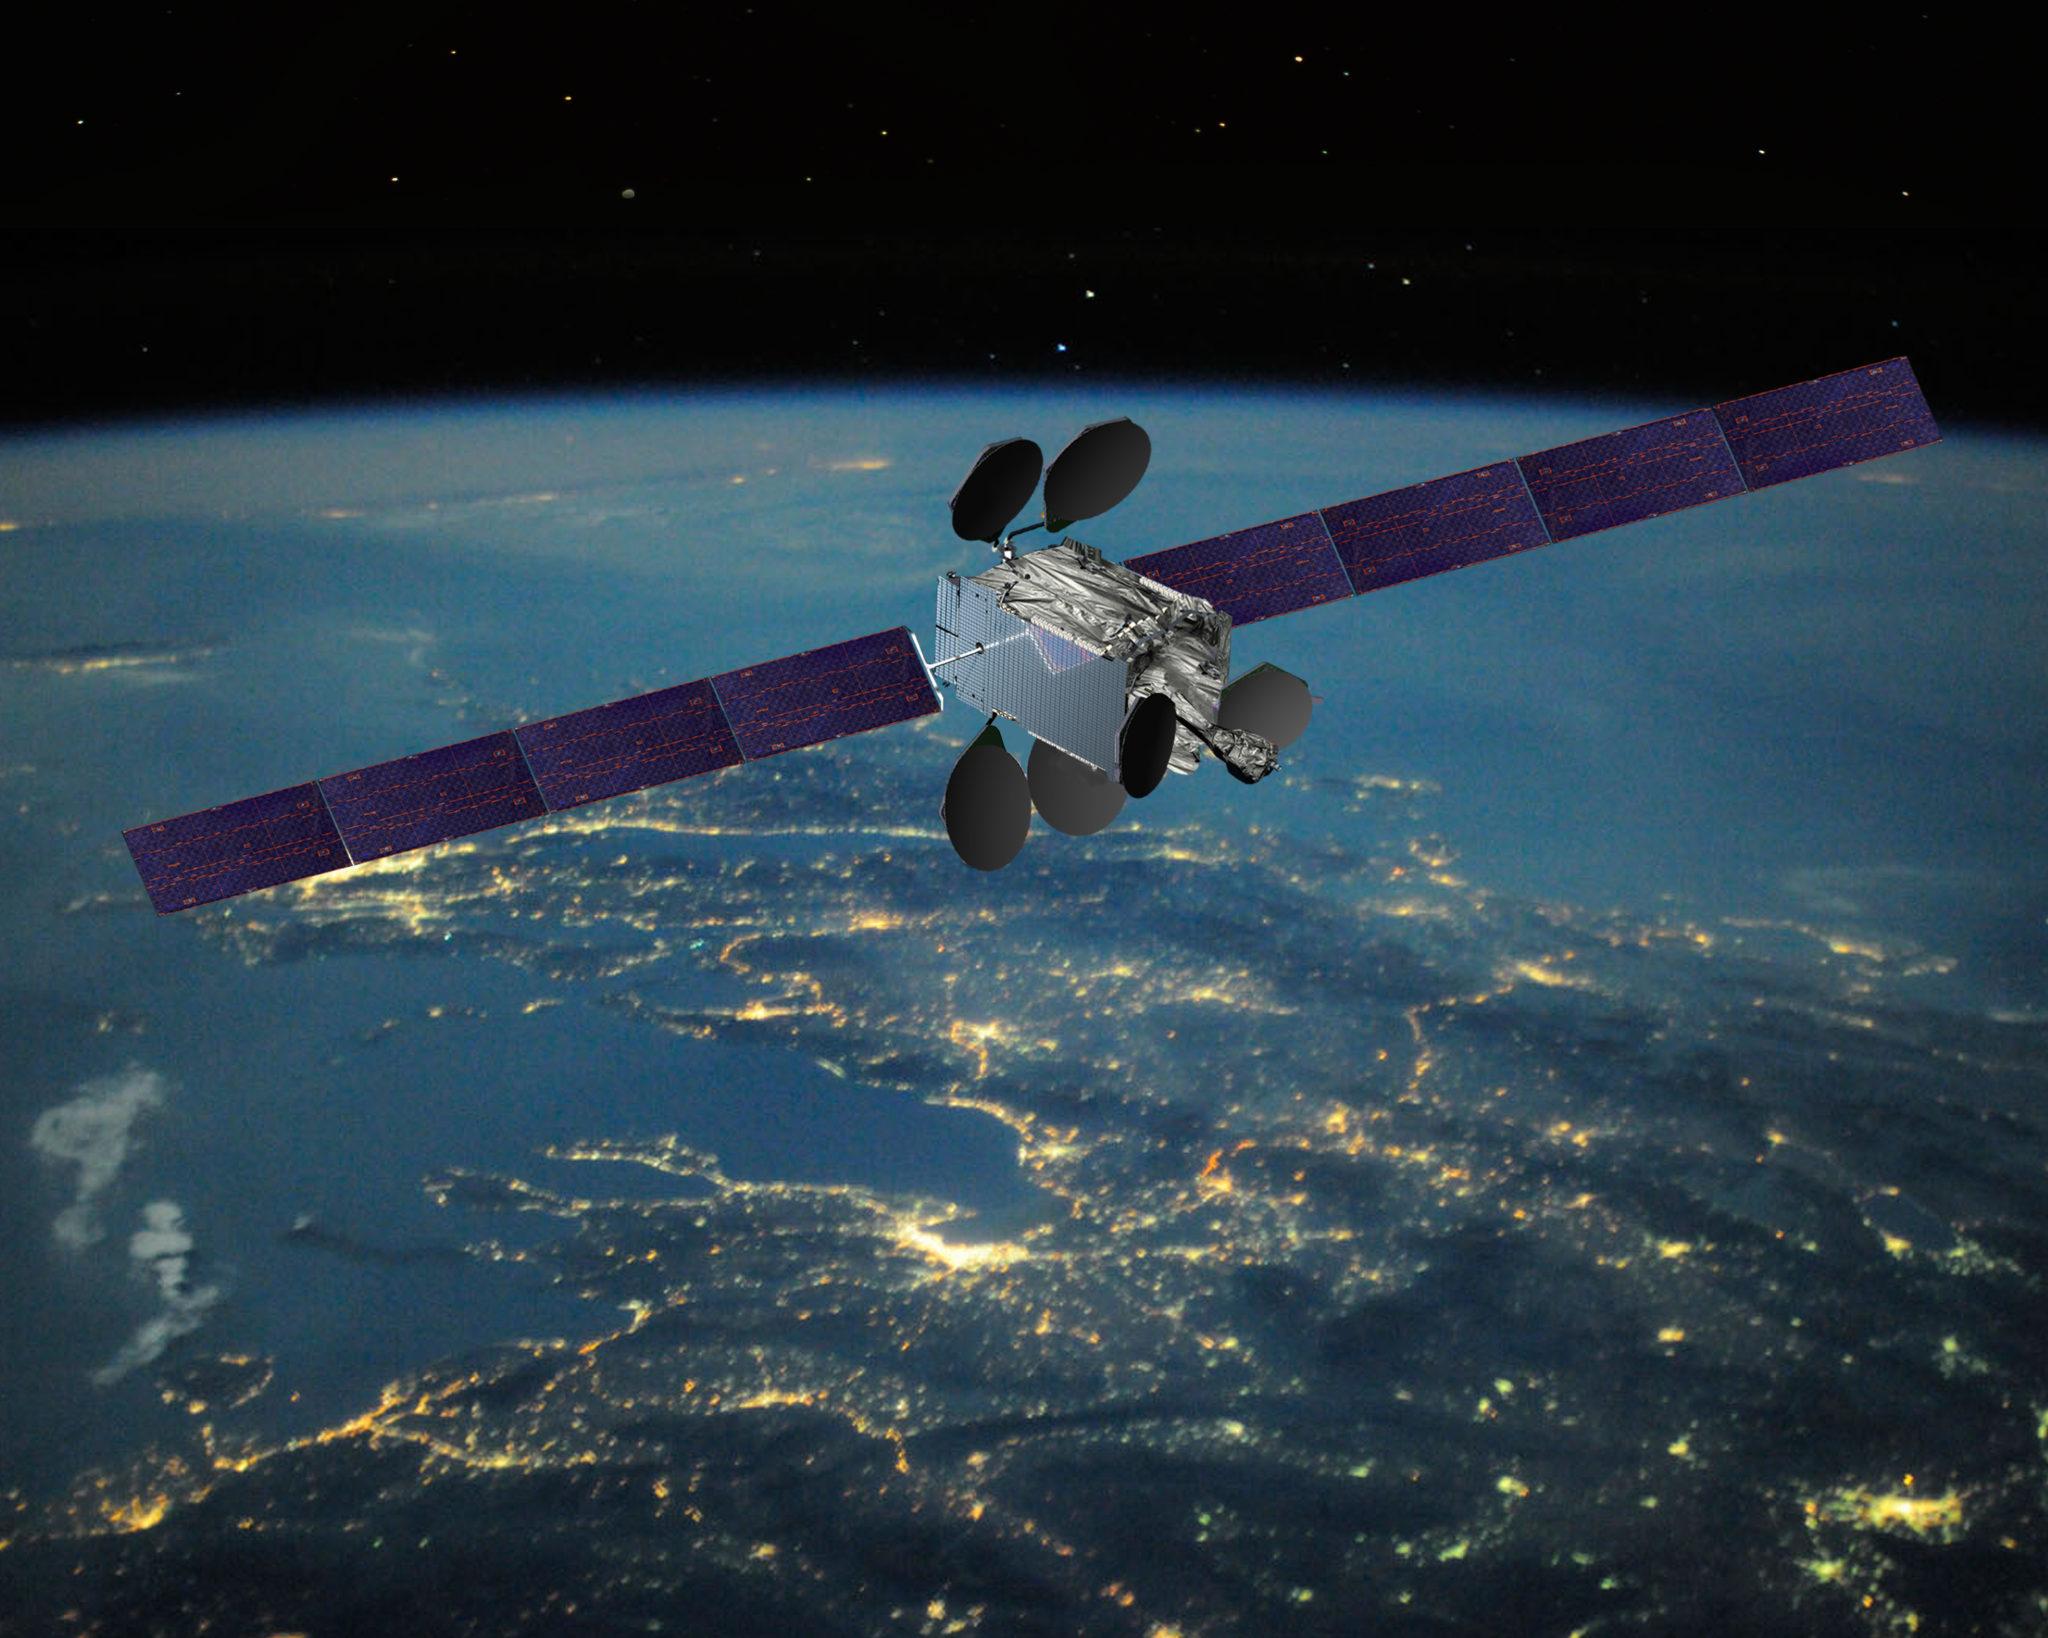 спутник в космосе фото еле